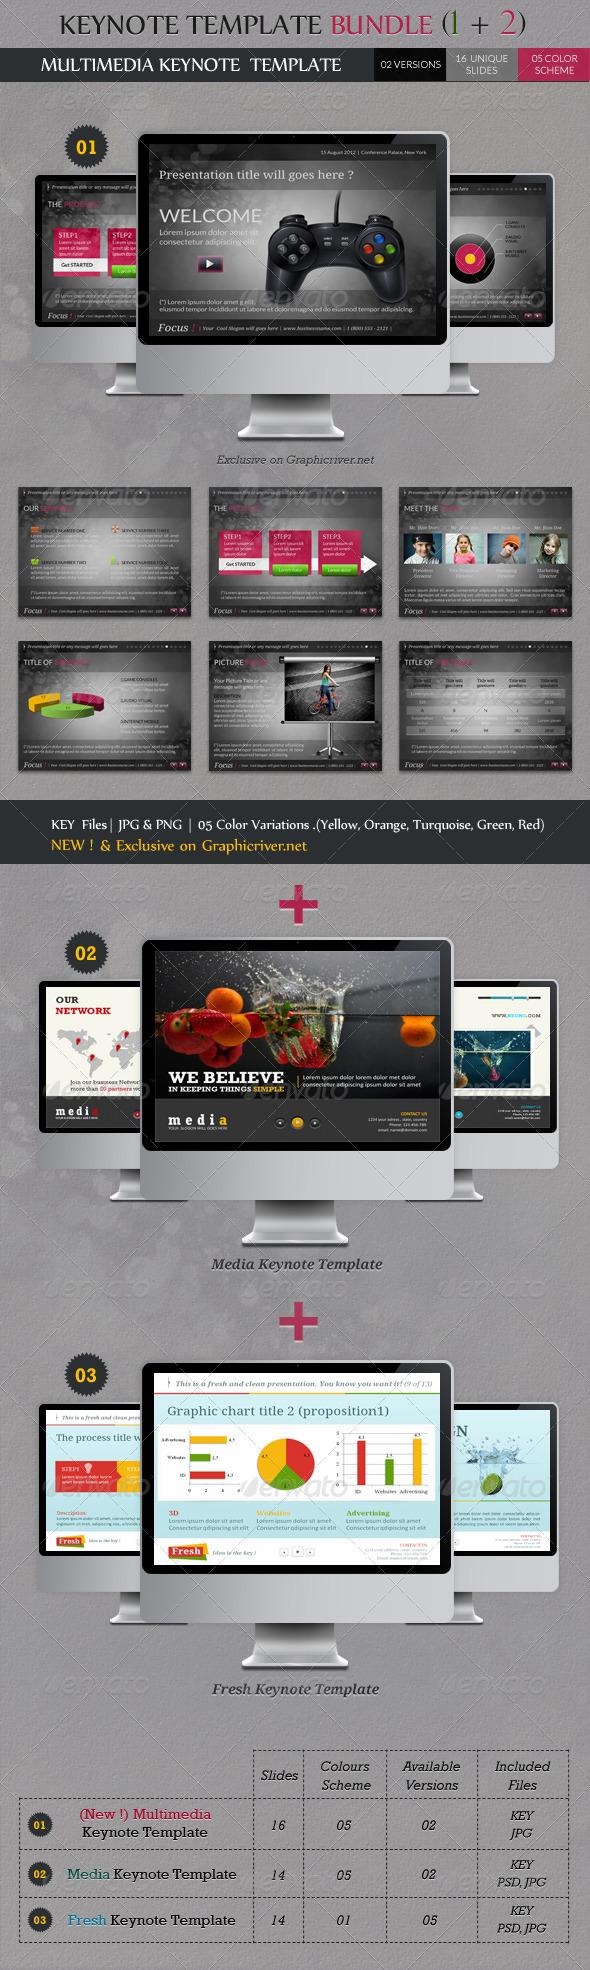 GraphicRiver Keynote Templates Bundle 1 & 2 3360789